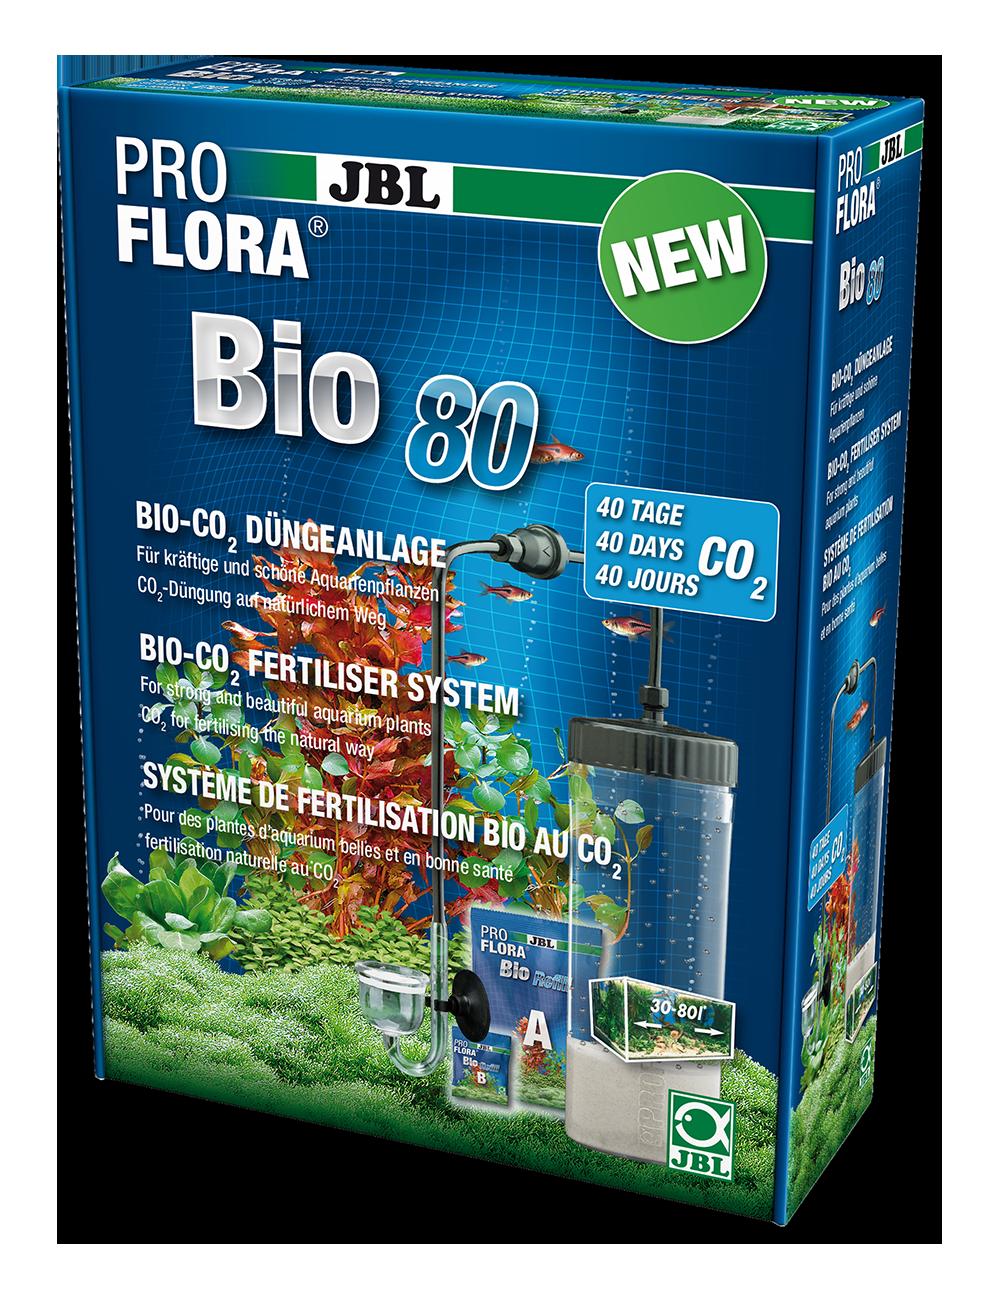 JBL - ProFlora bio80 2 - 40 jours